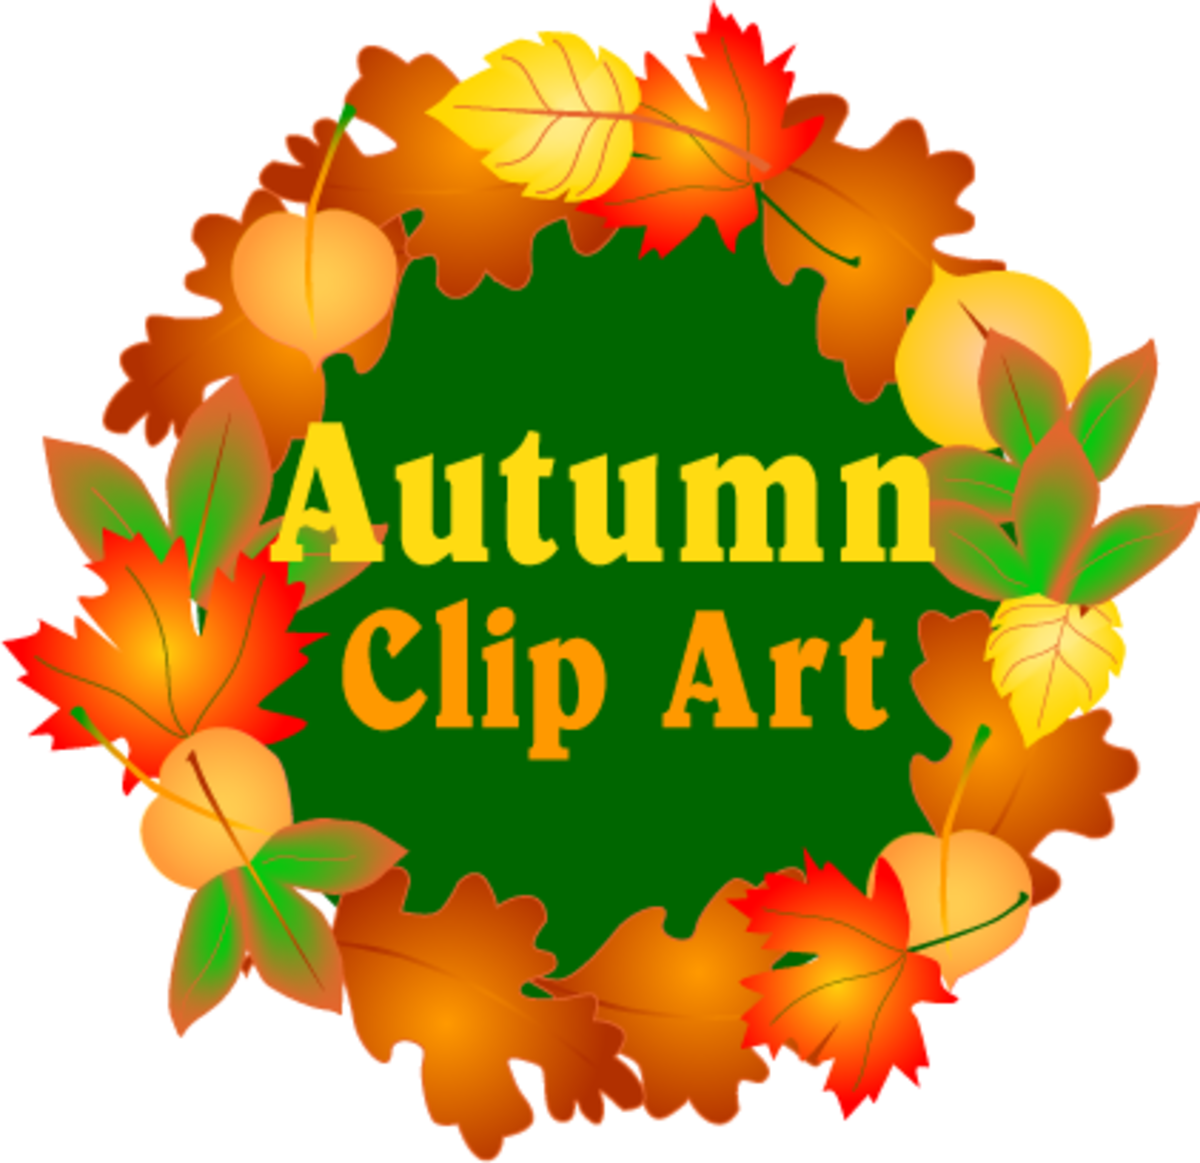 Autumn Clip Art - Fall Season Graphics